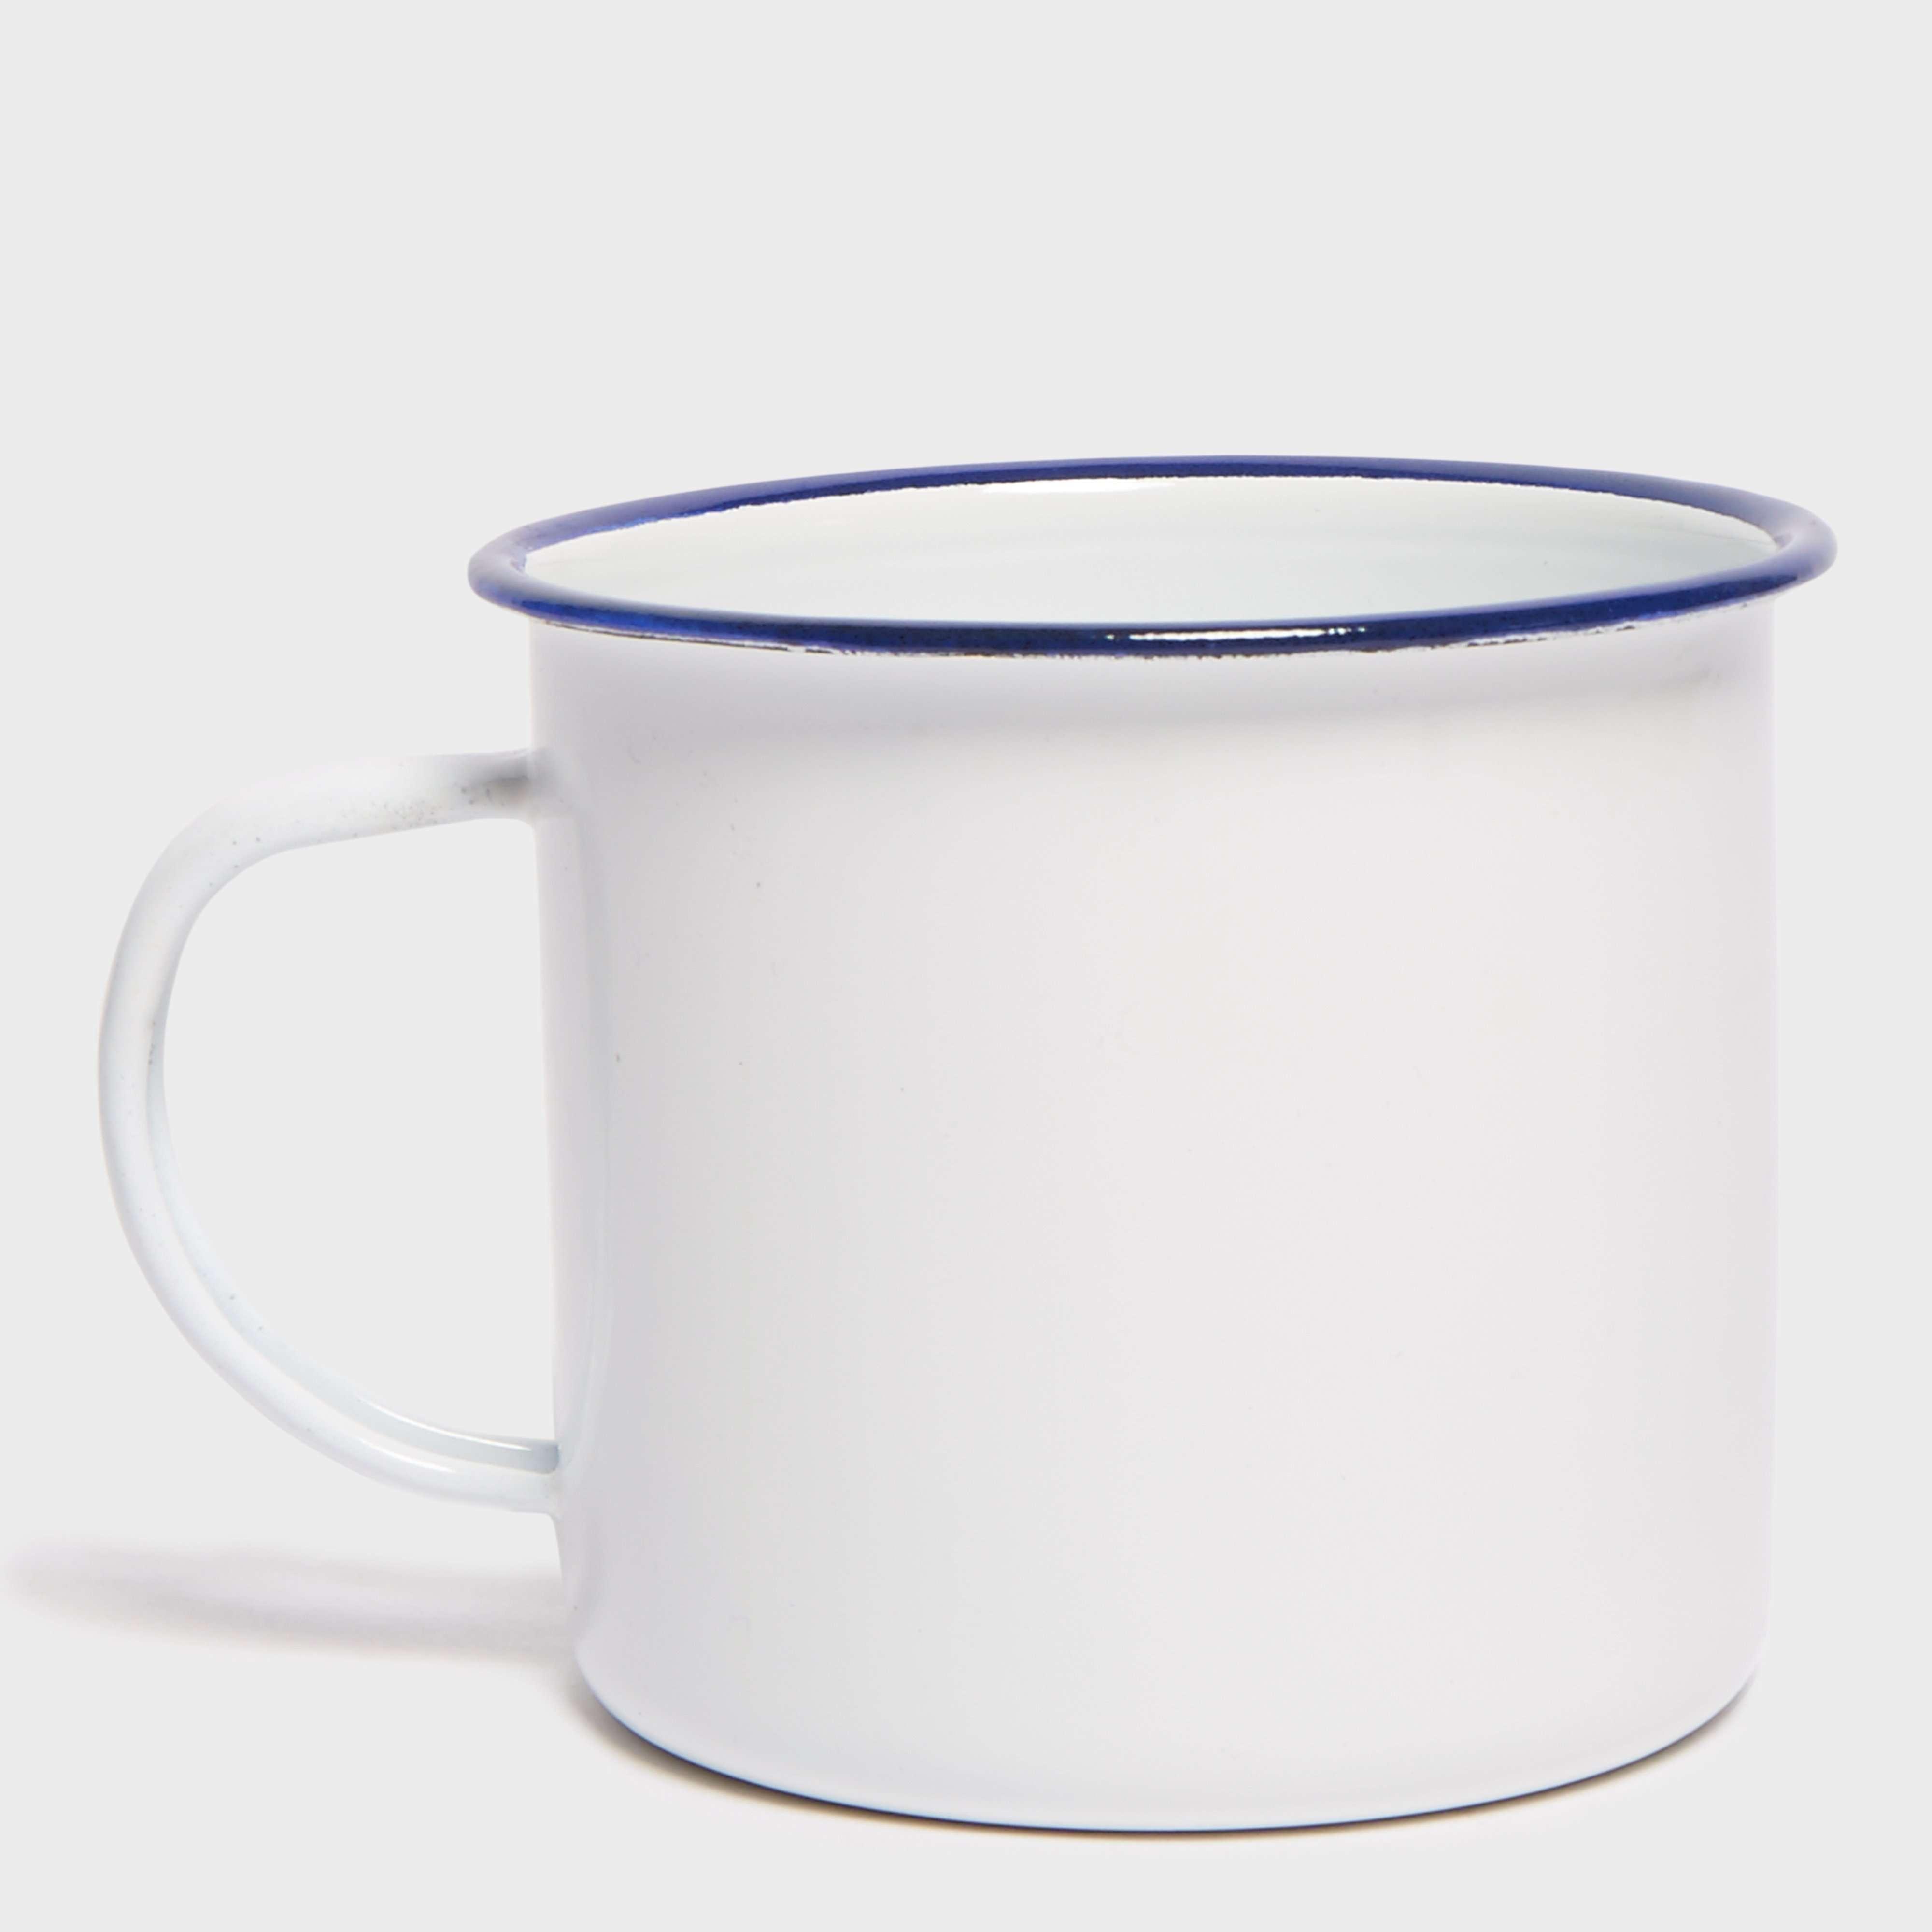 HIGHLANDER Enamel Mug 560ml